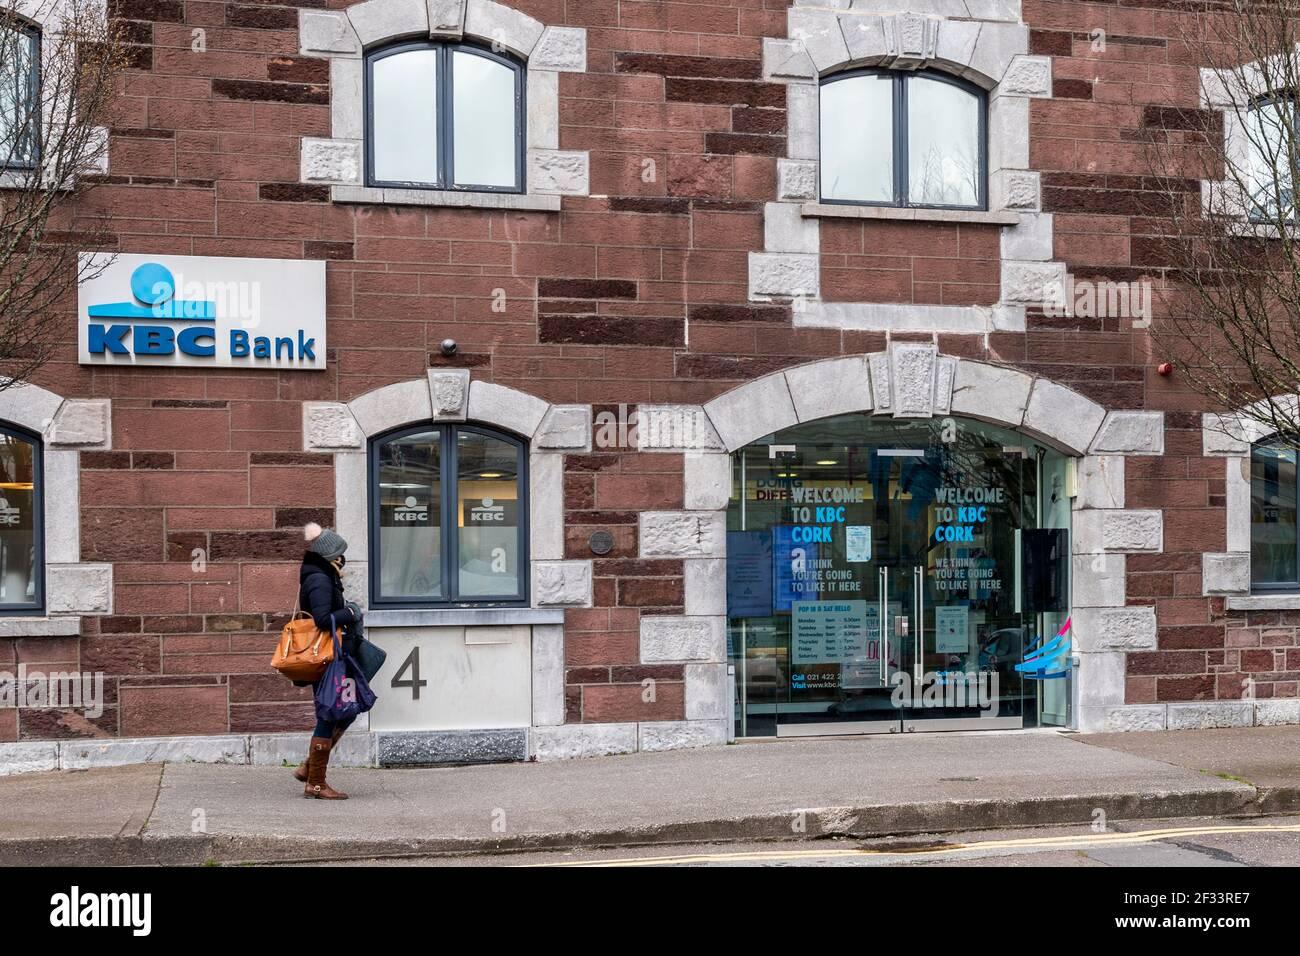 kbc-bank-branch-in-cork-city-ireland-2F33RE7.jpg